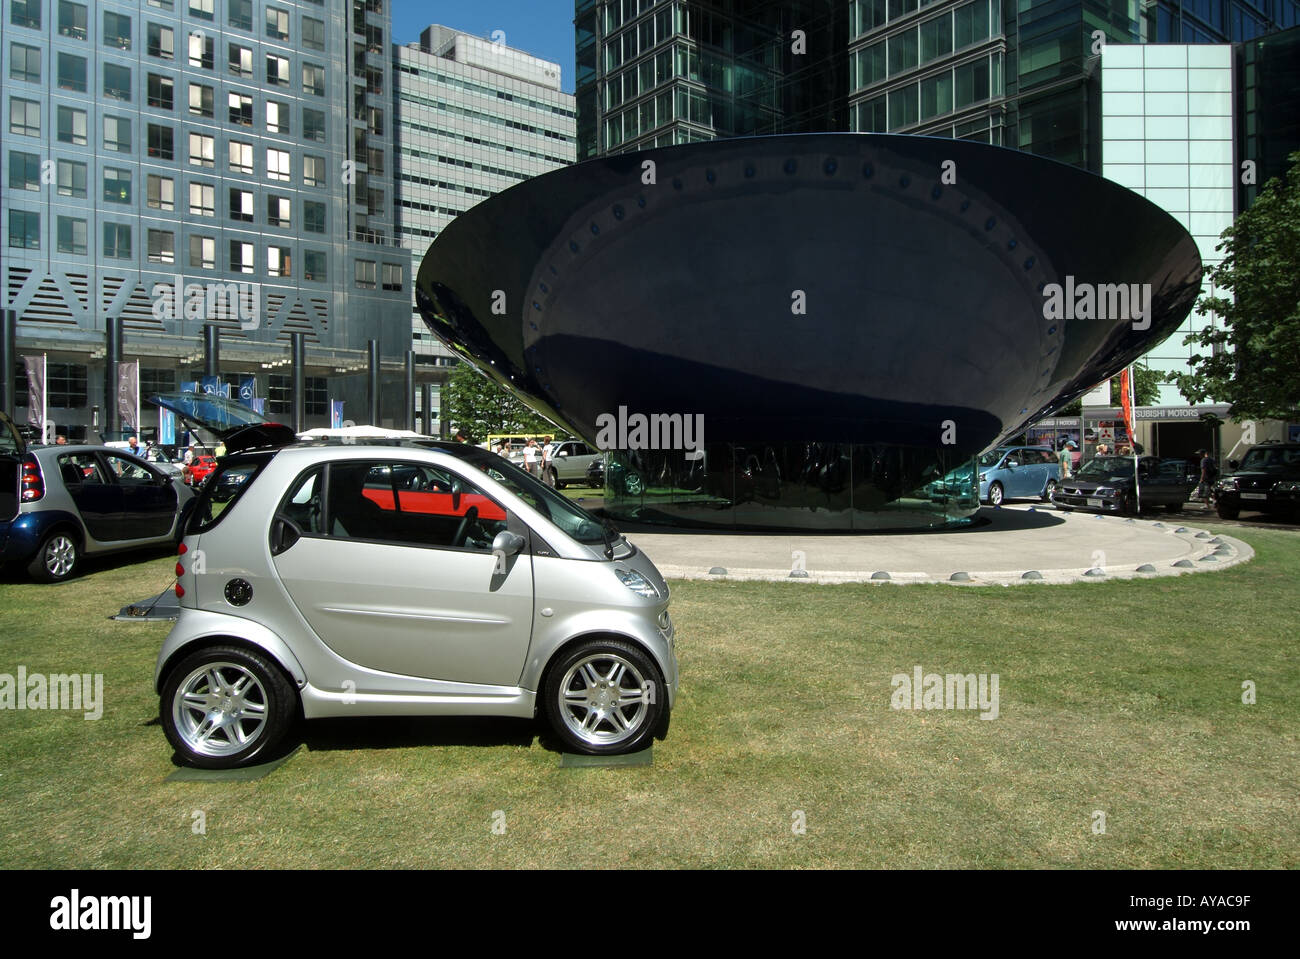 London Canary Wharf Motor Expo car motor show organised by Daily Telegraph Daimler Chrysler Smart car Canada Tower Stock Photo